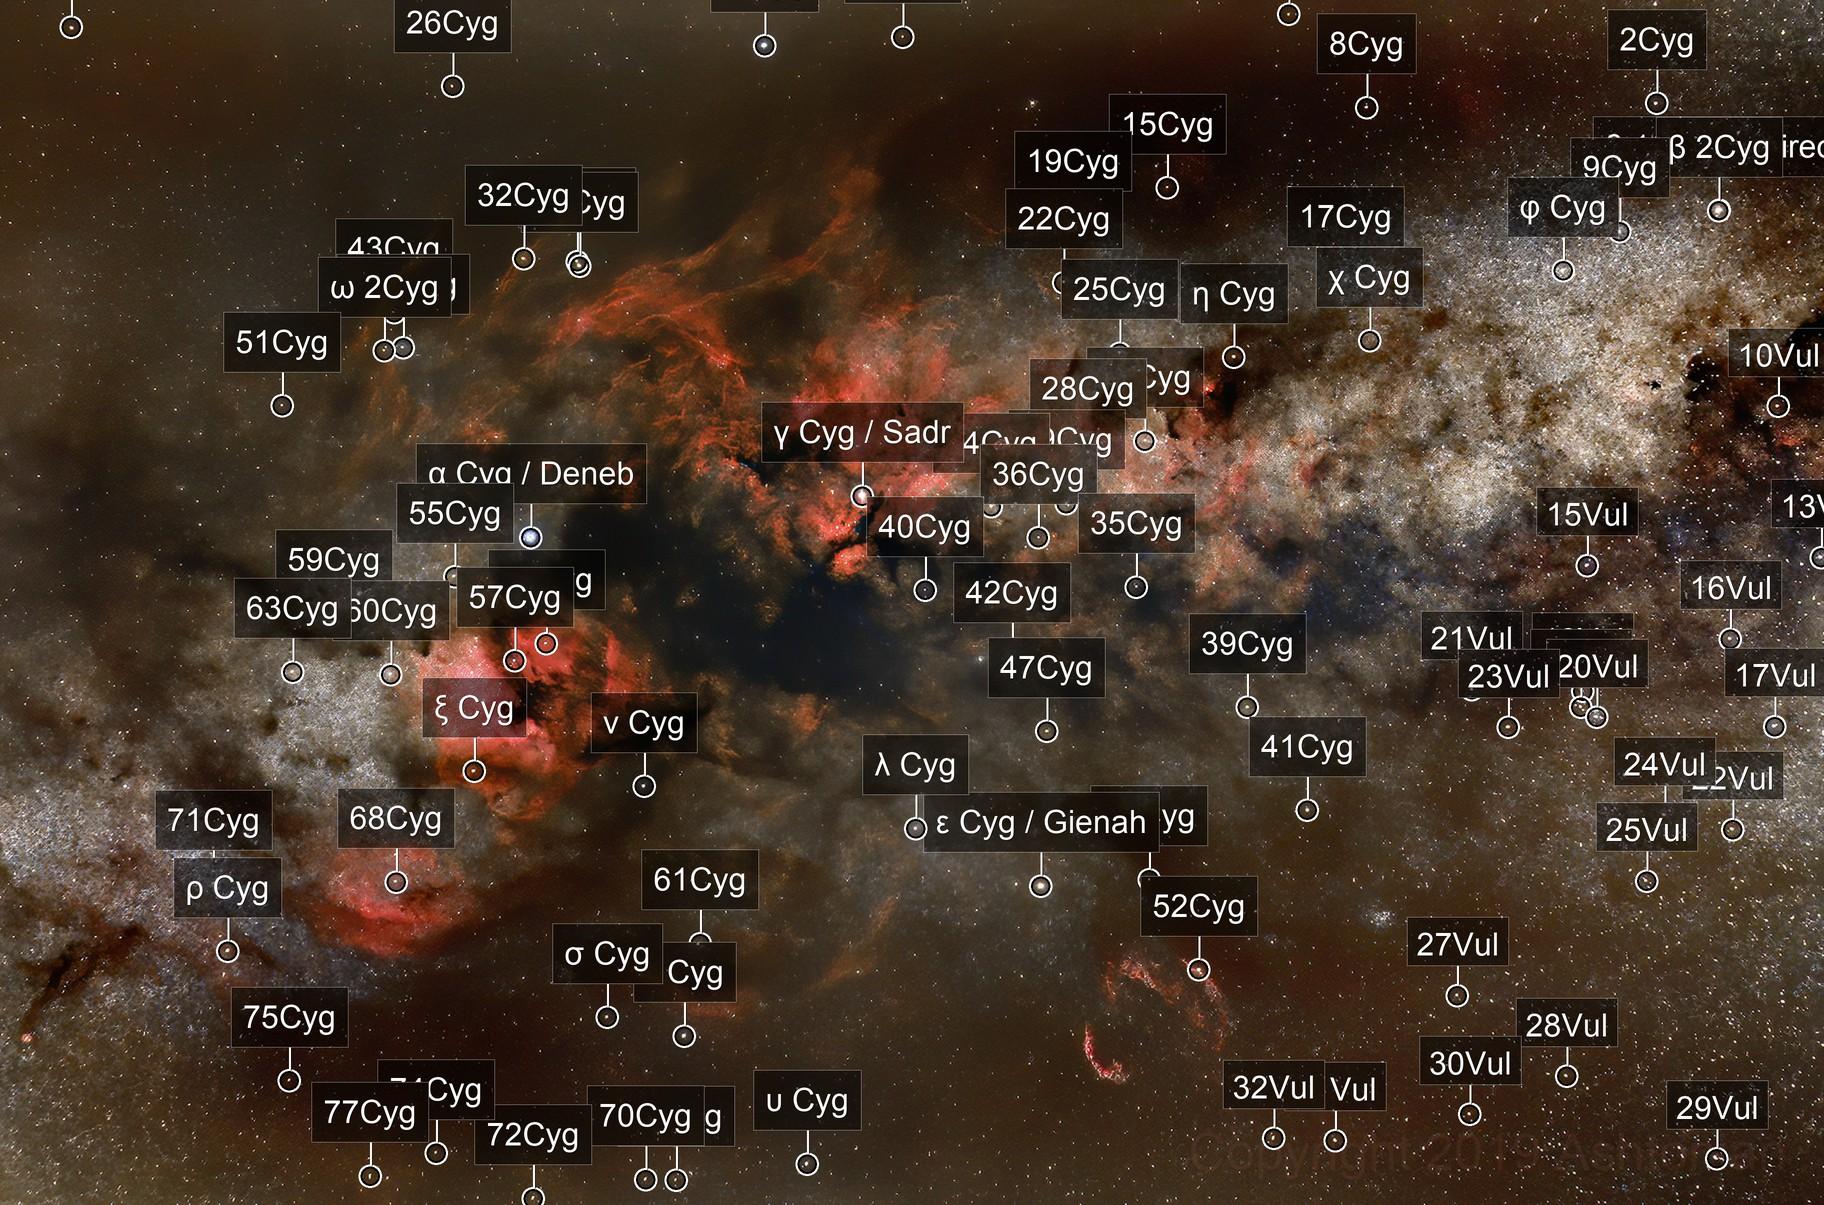 Cygnus Region of  The Milky Way - Widefield